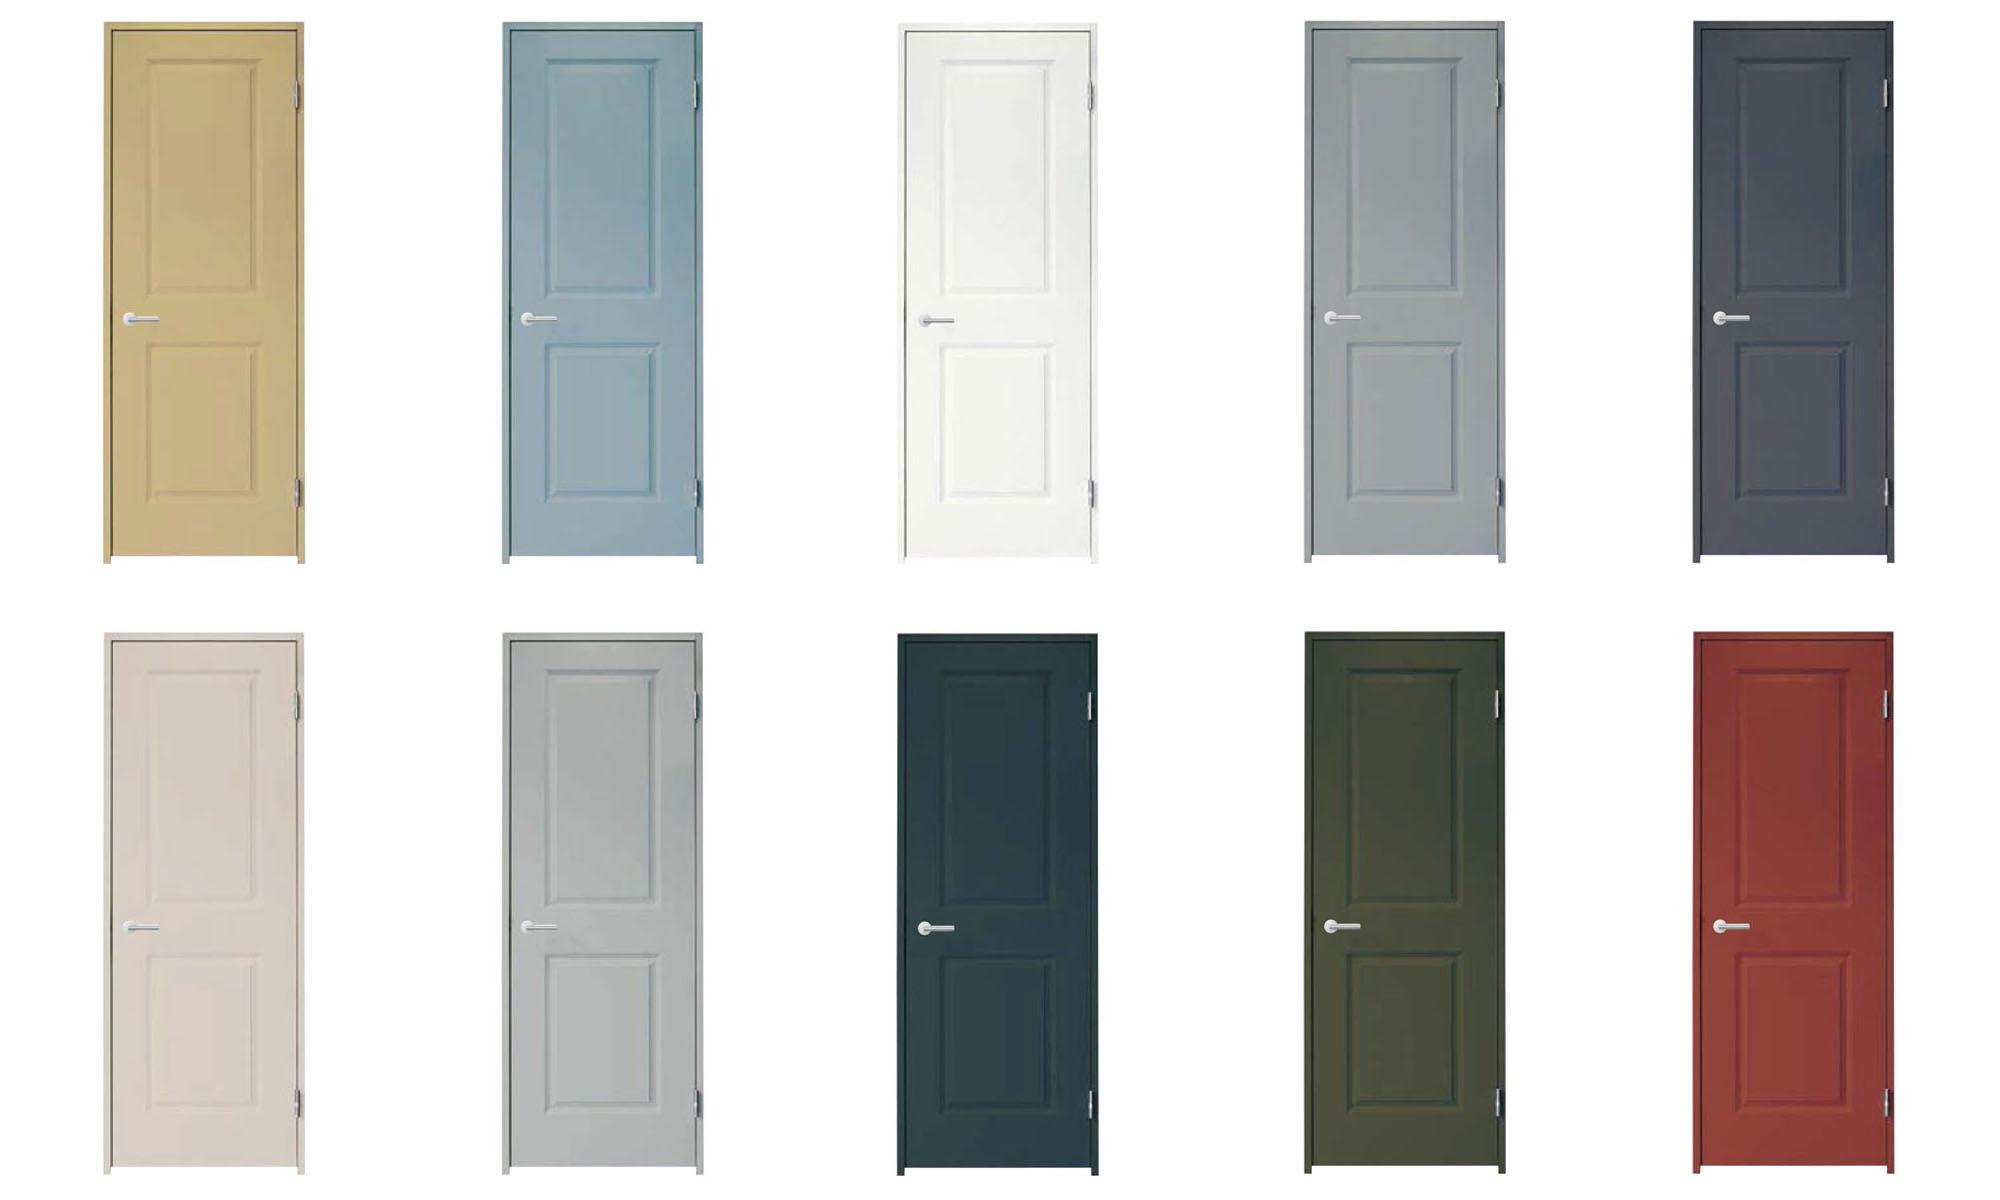 室内建具1F 集成無垢単板貼りドア ※色選択可